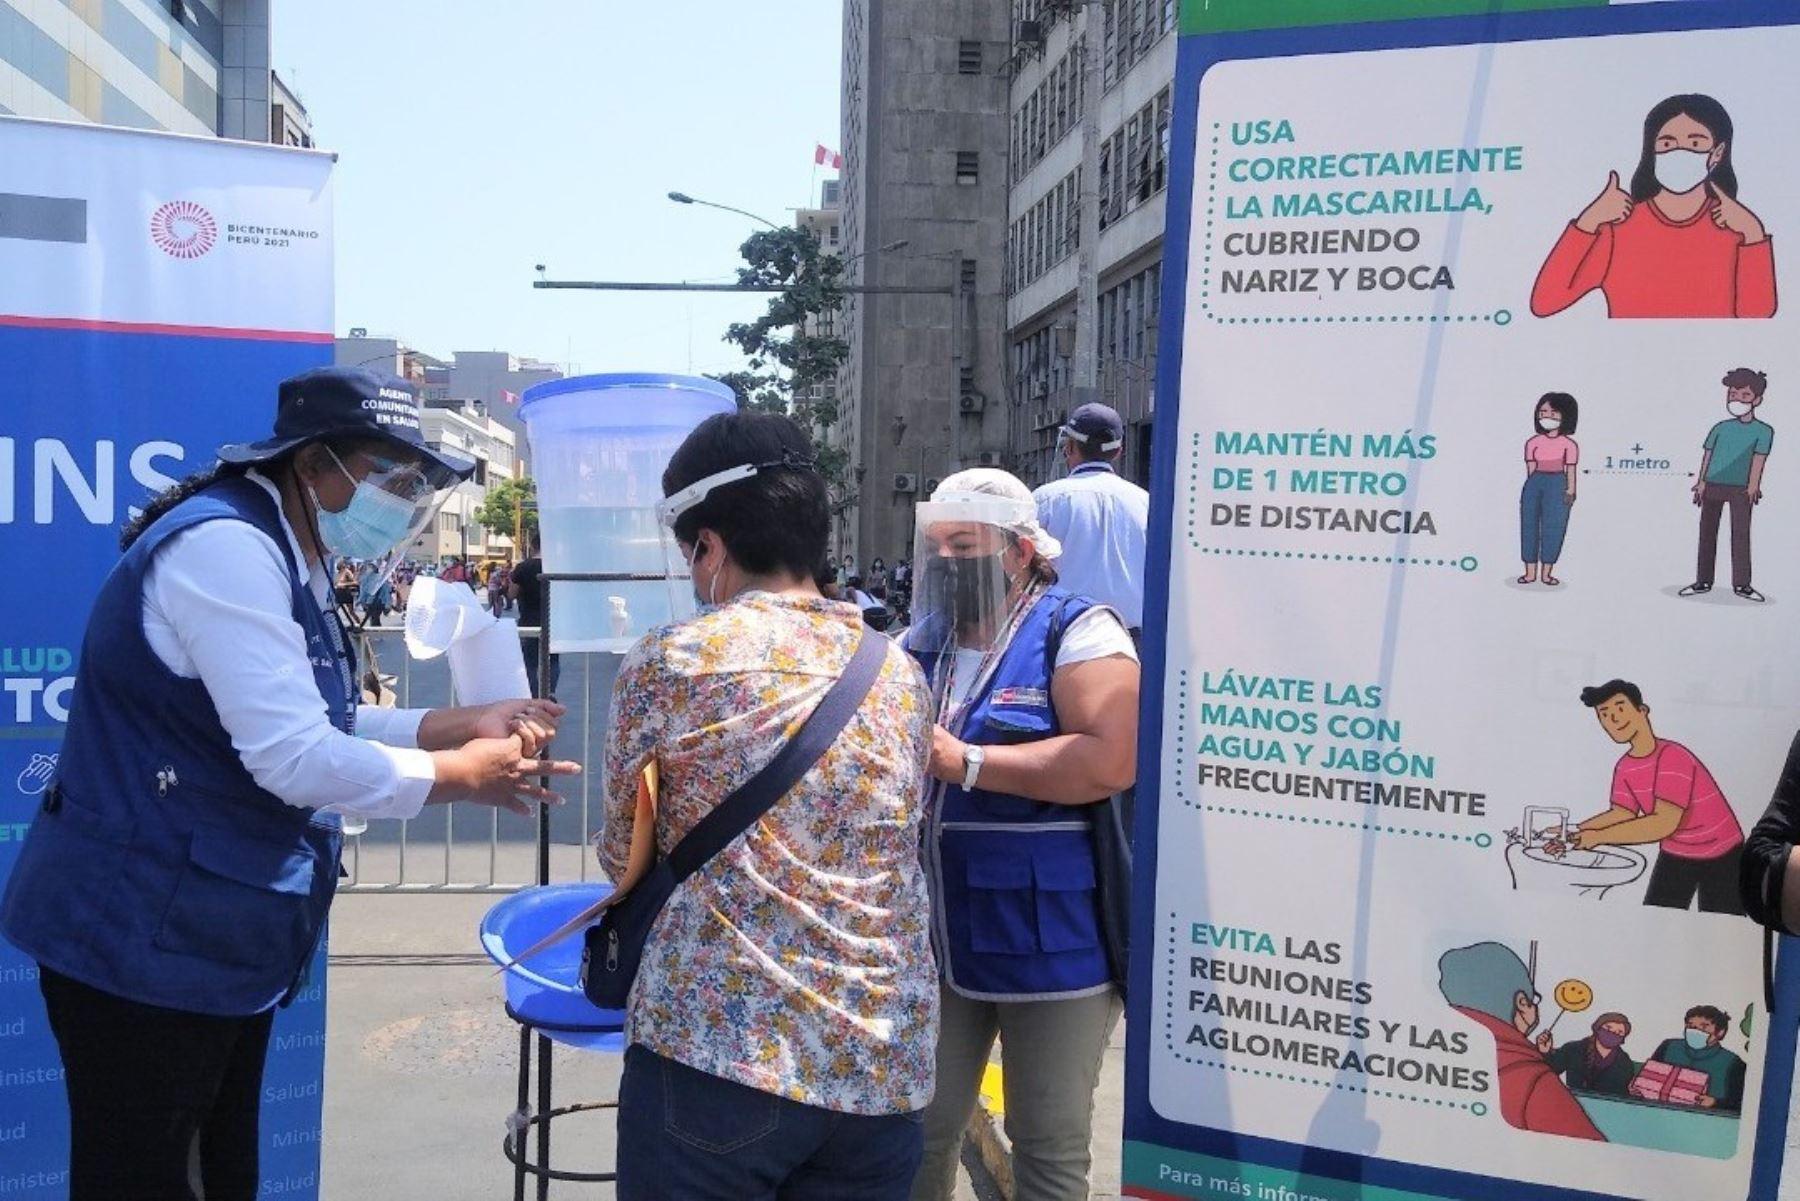 Minsa verifica uso obligatorio de protector facial en el Mercado Central. Foto: ANDINA/Difusión.